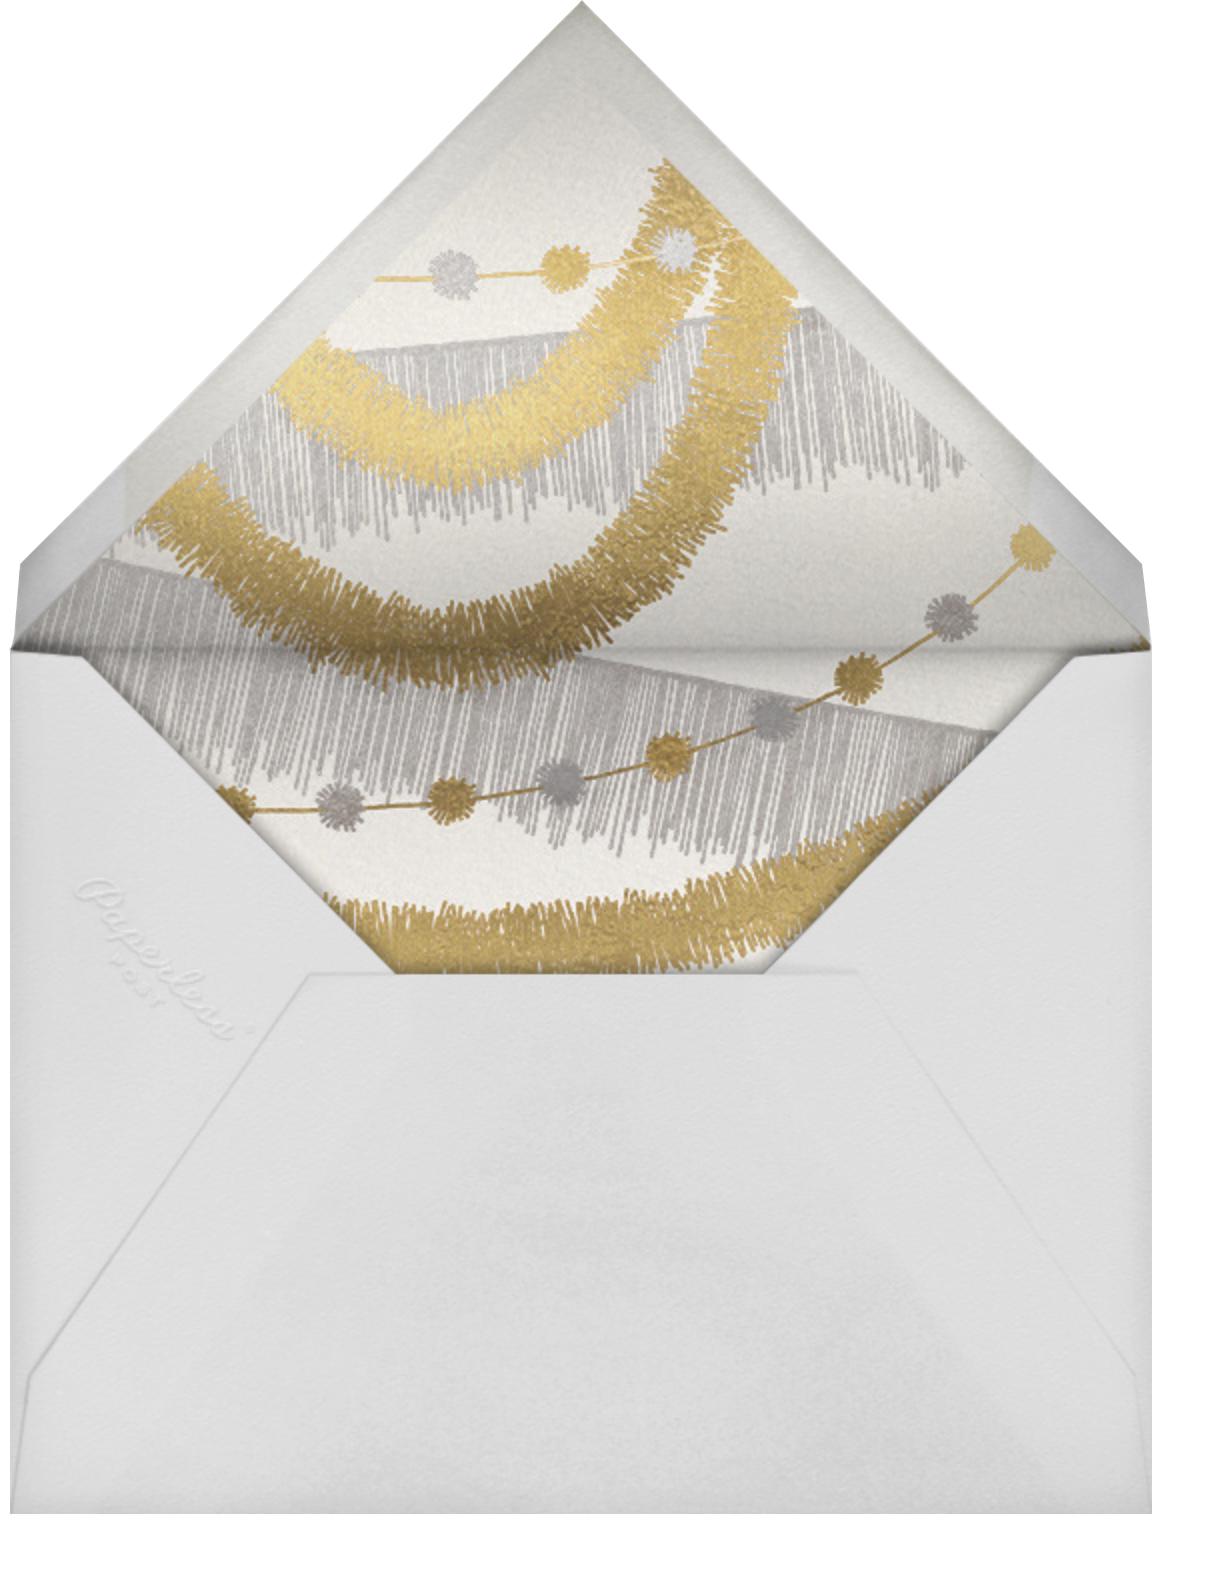 Snowdrift (Multi-Photo) - Spring Rain - Paperless Post - Envelope